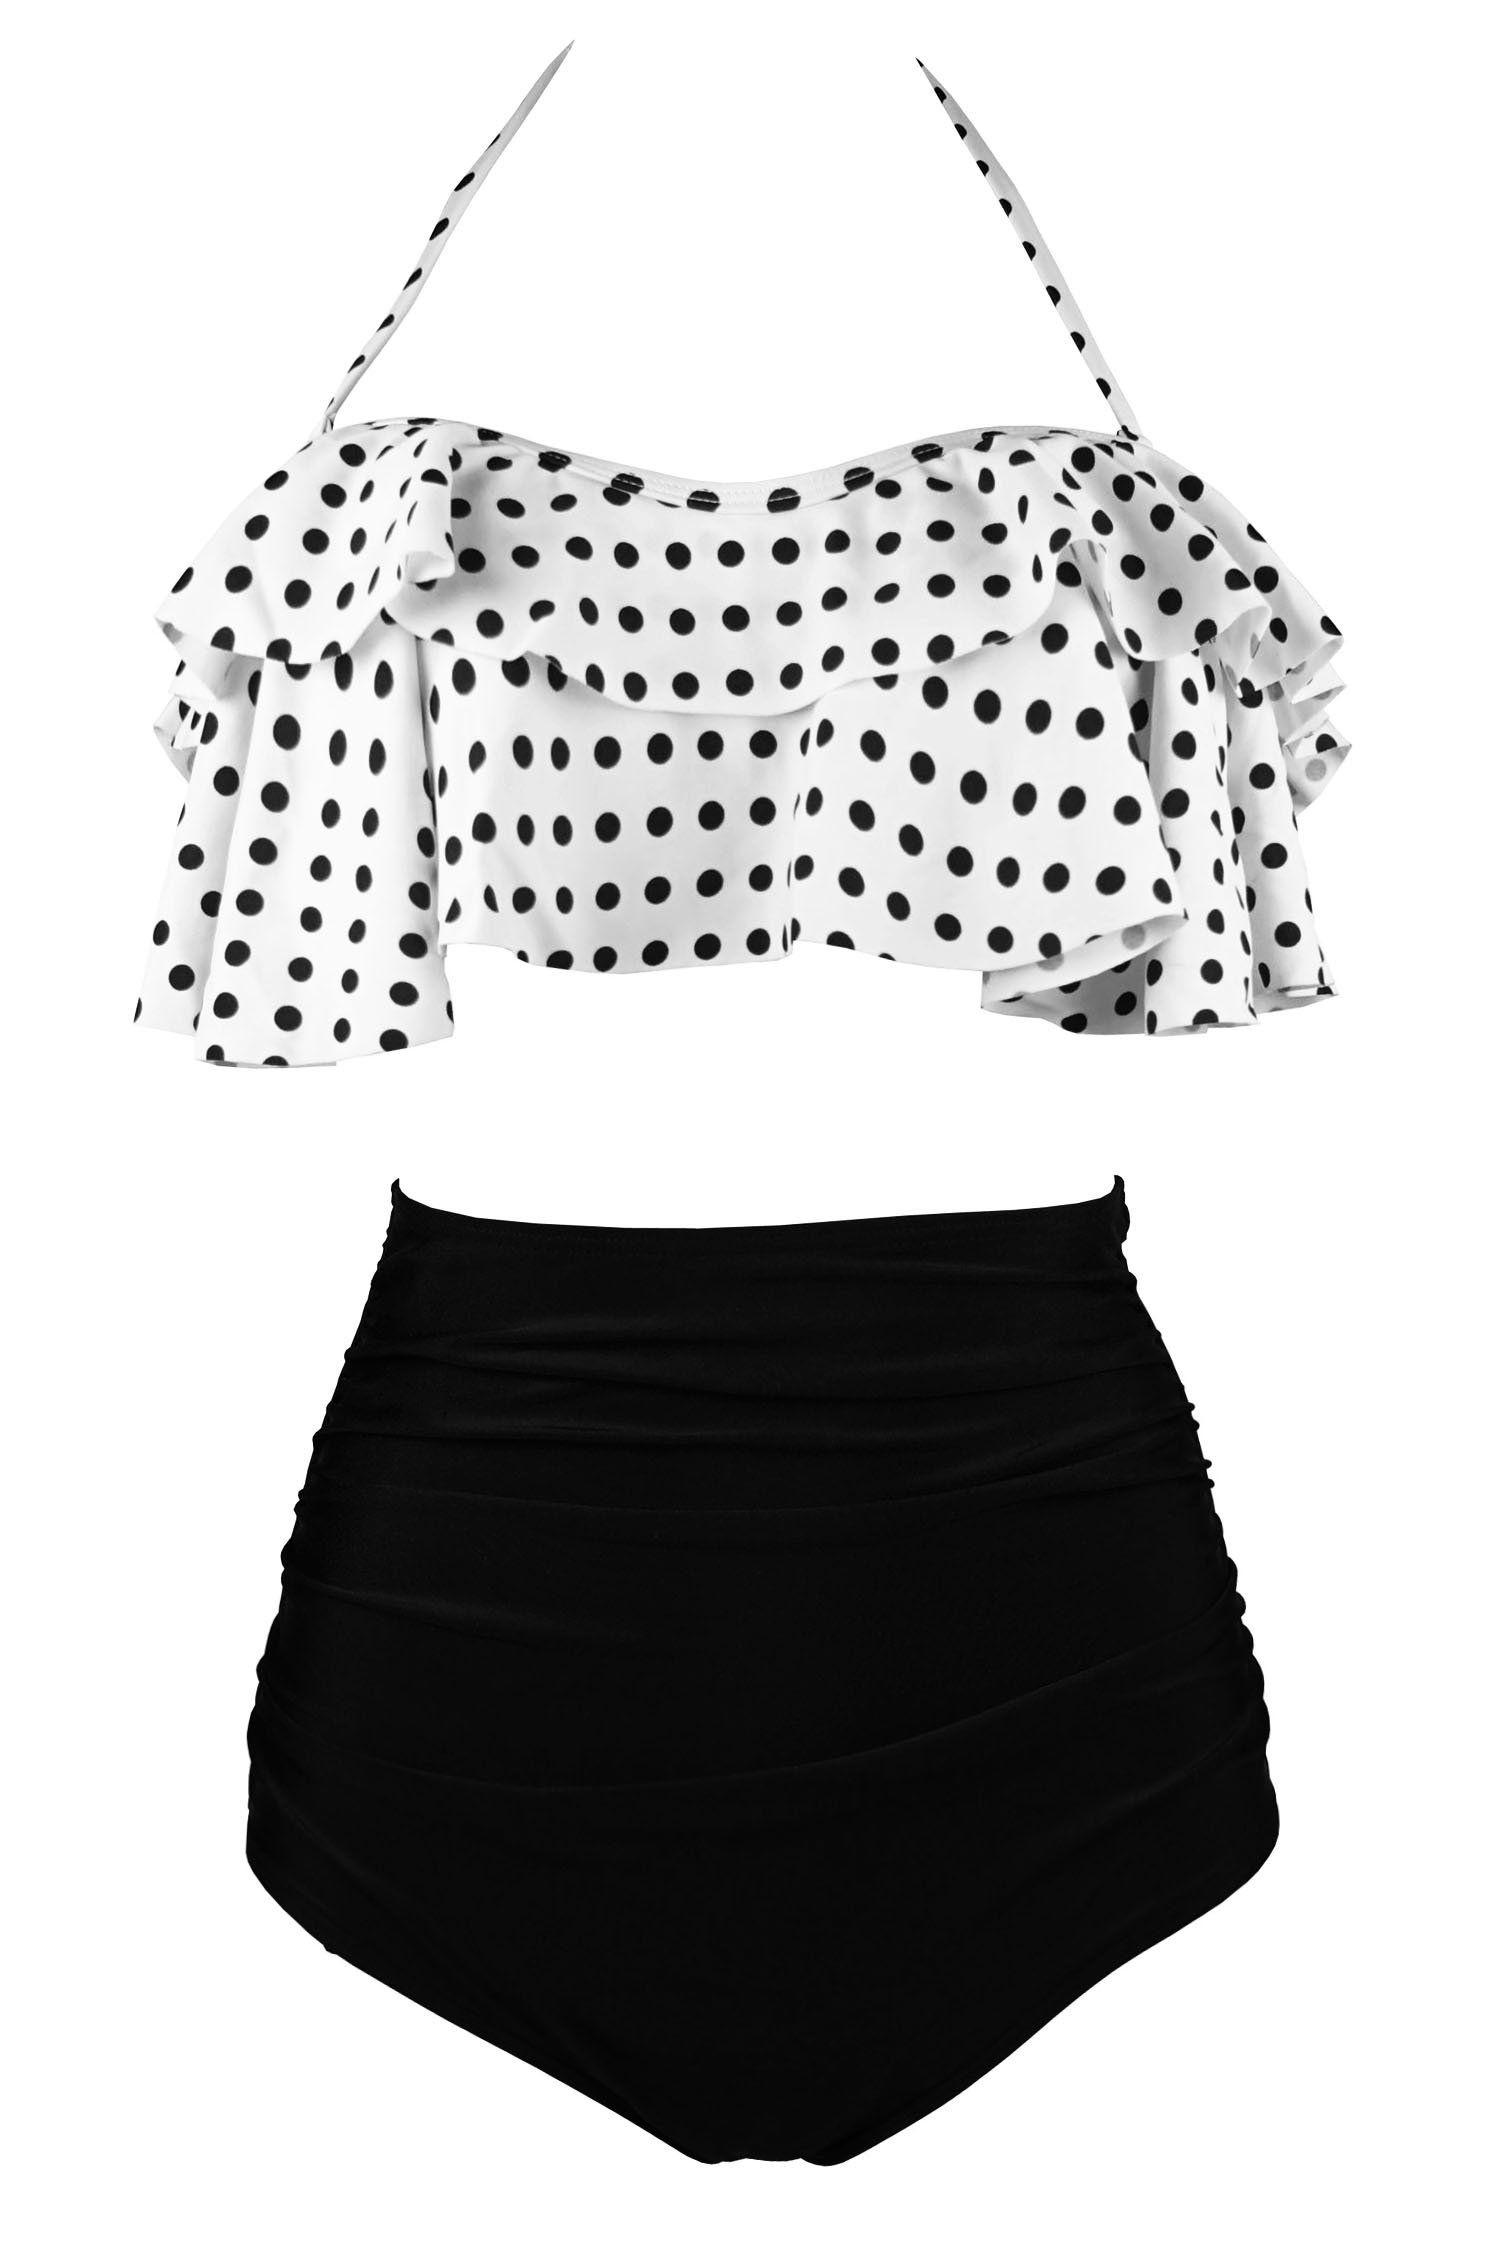 42fcbf85ec Cocoship White   Black Polka Dot Retro Boho Flounce Falbala High Waist  Bikini Set Chic Swimsuit Bathing Suit XXL(FBA)